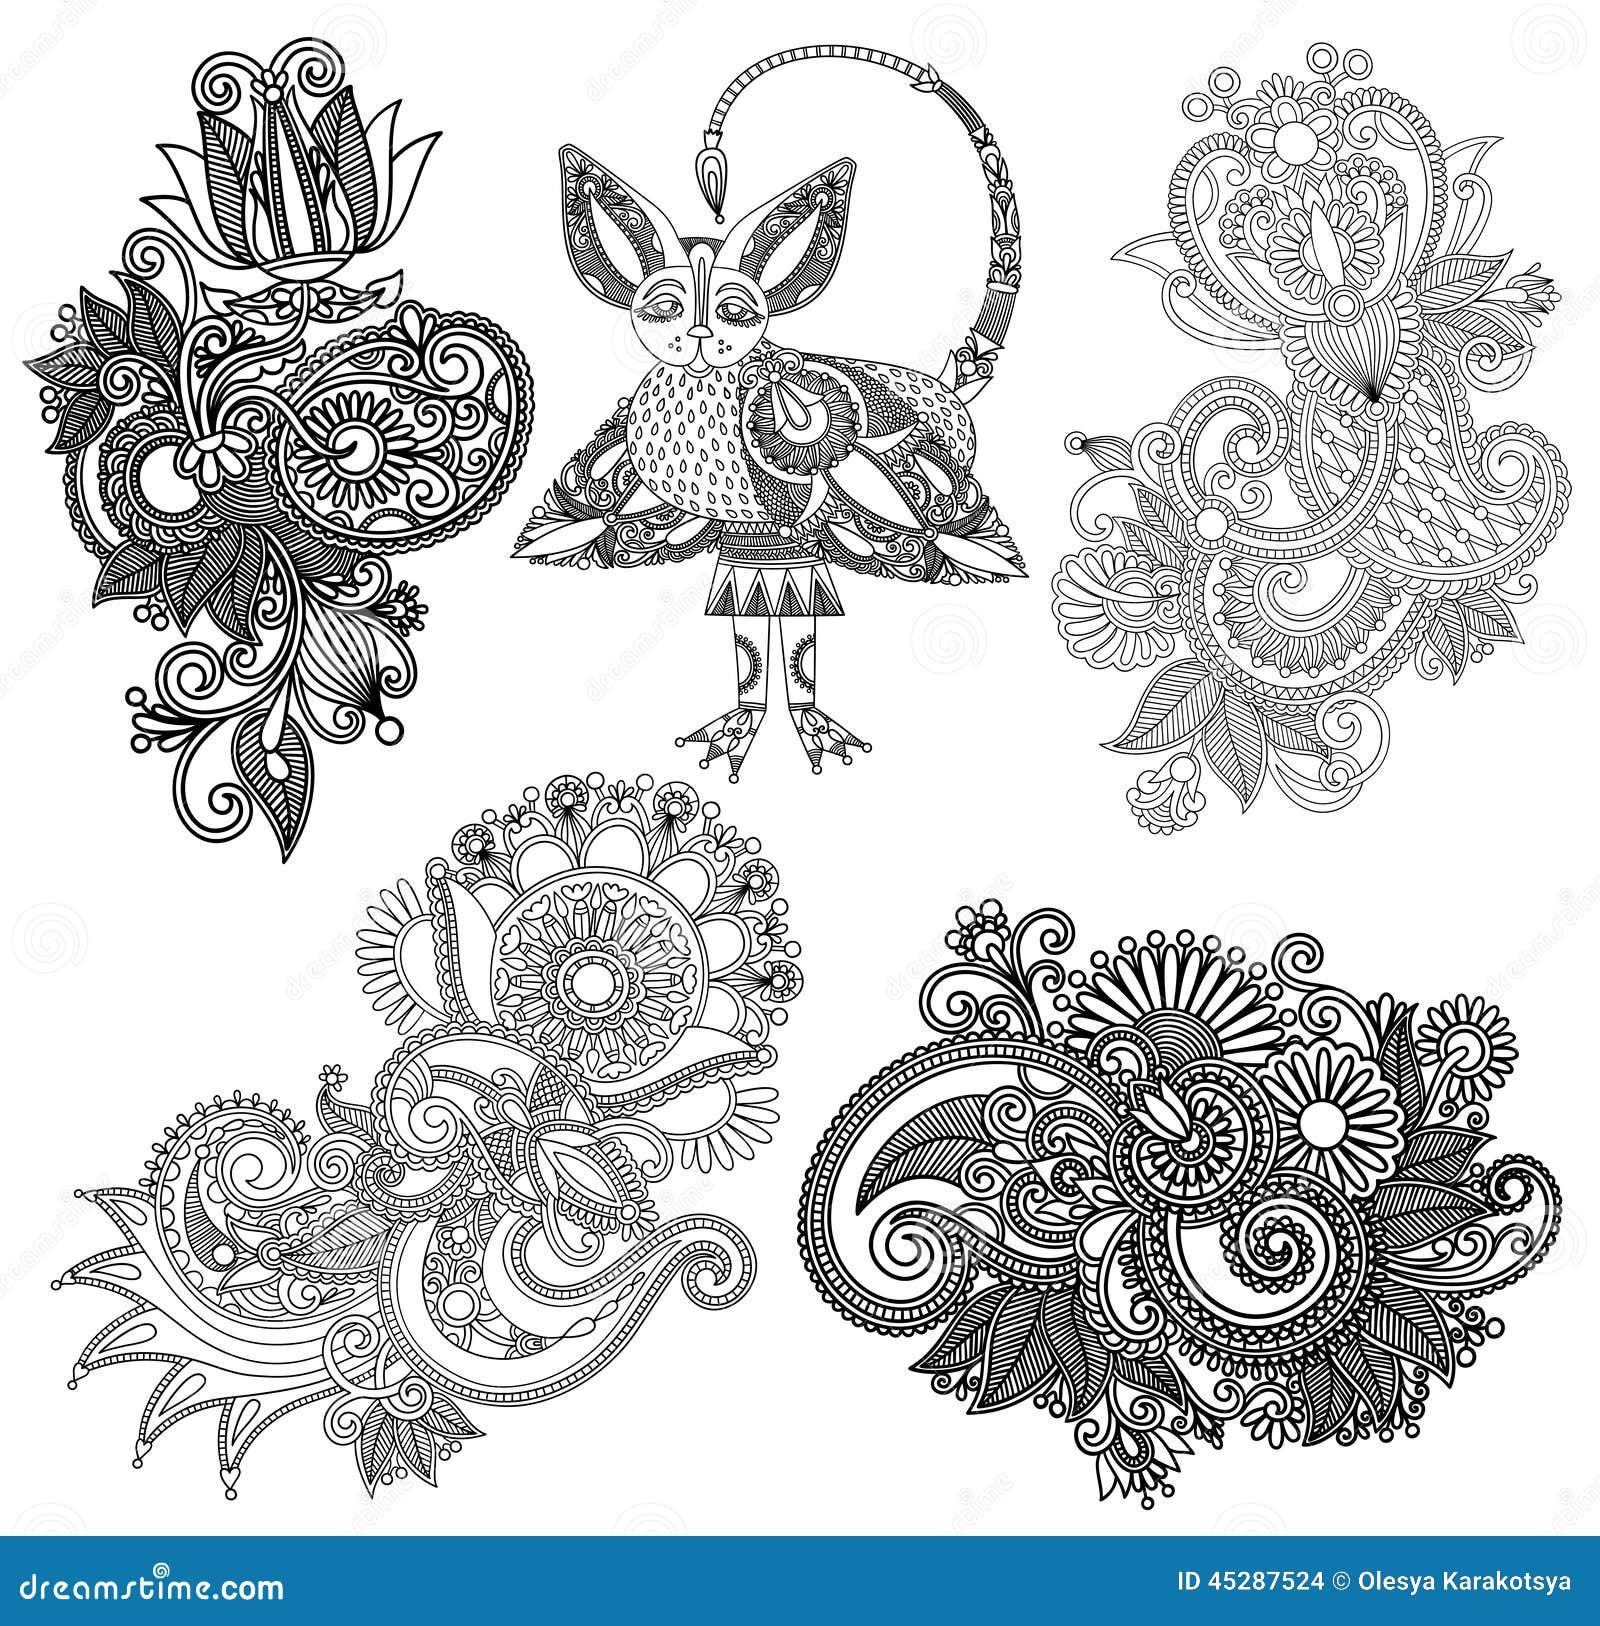 Line Art Flower Design : Black line art ornate flower design collection stock